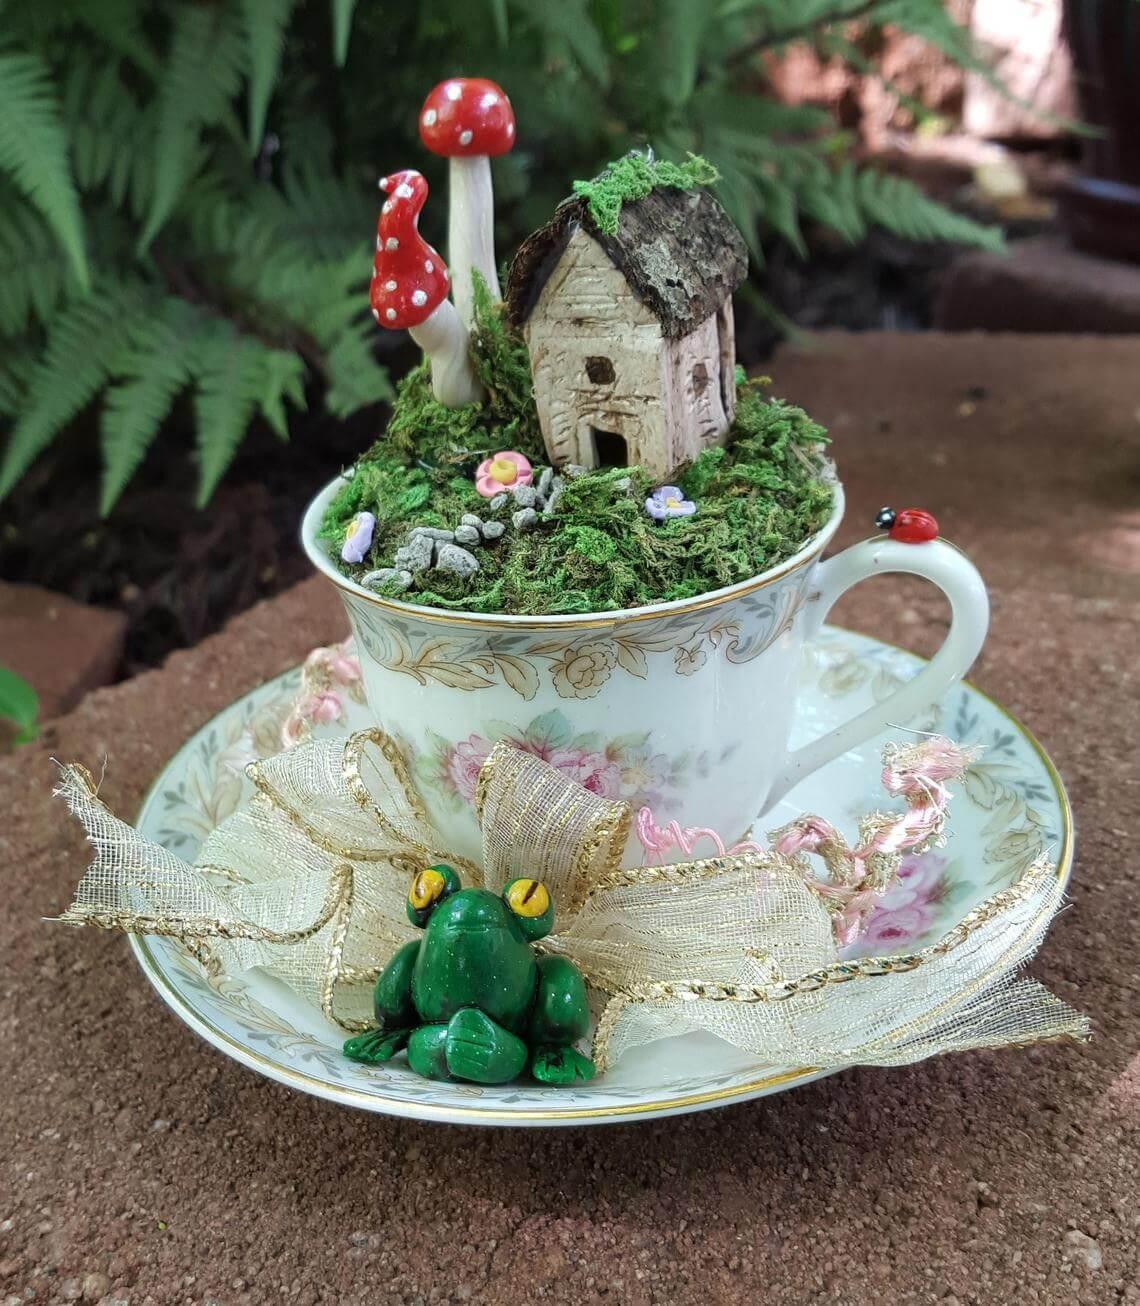 Rustic Victorian Teacup Miniature Garden